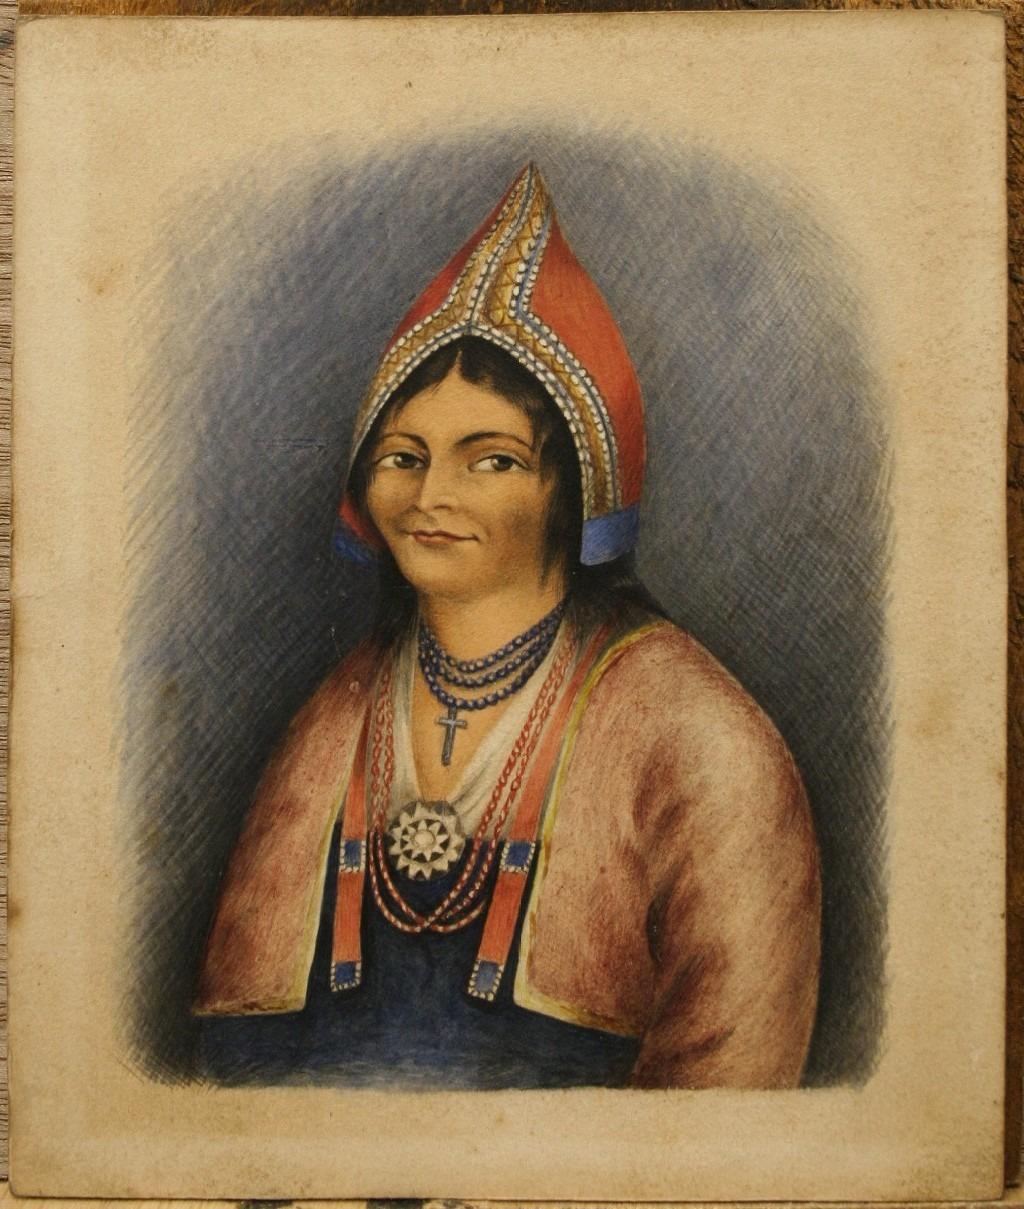 PORTRAIT OF MARY THOMAS